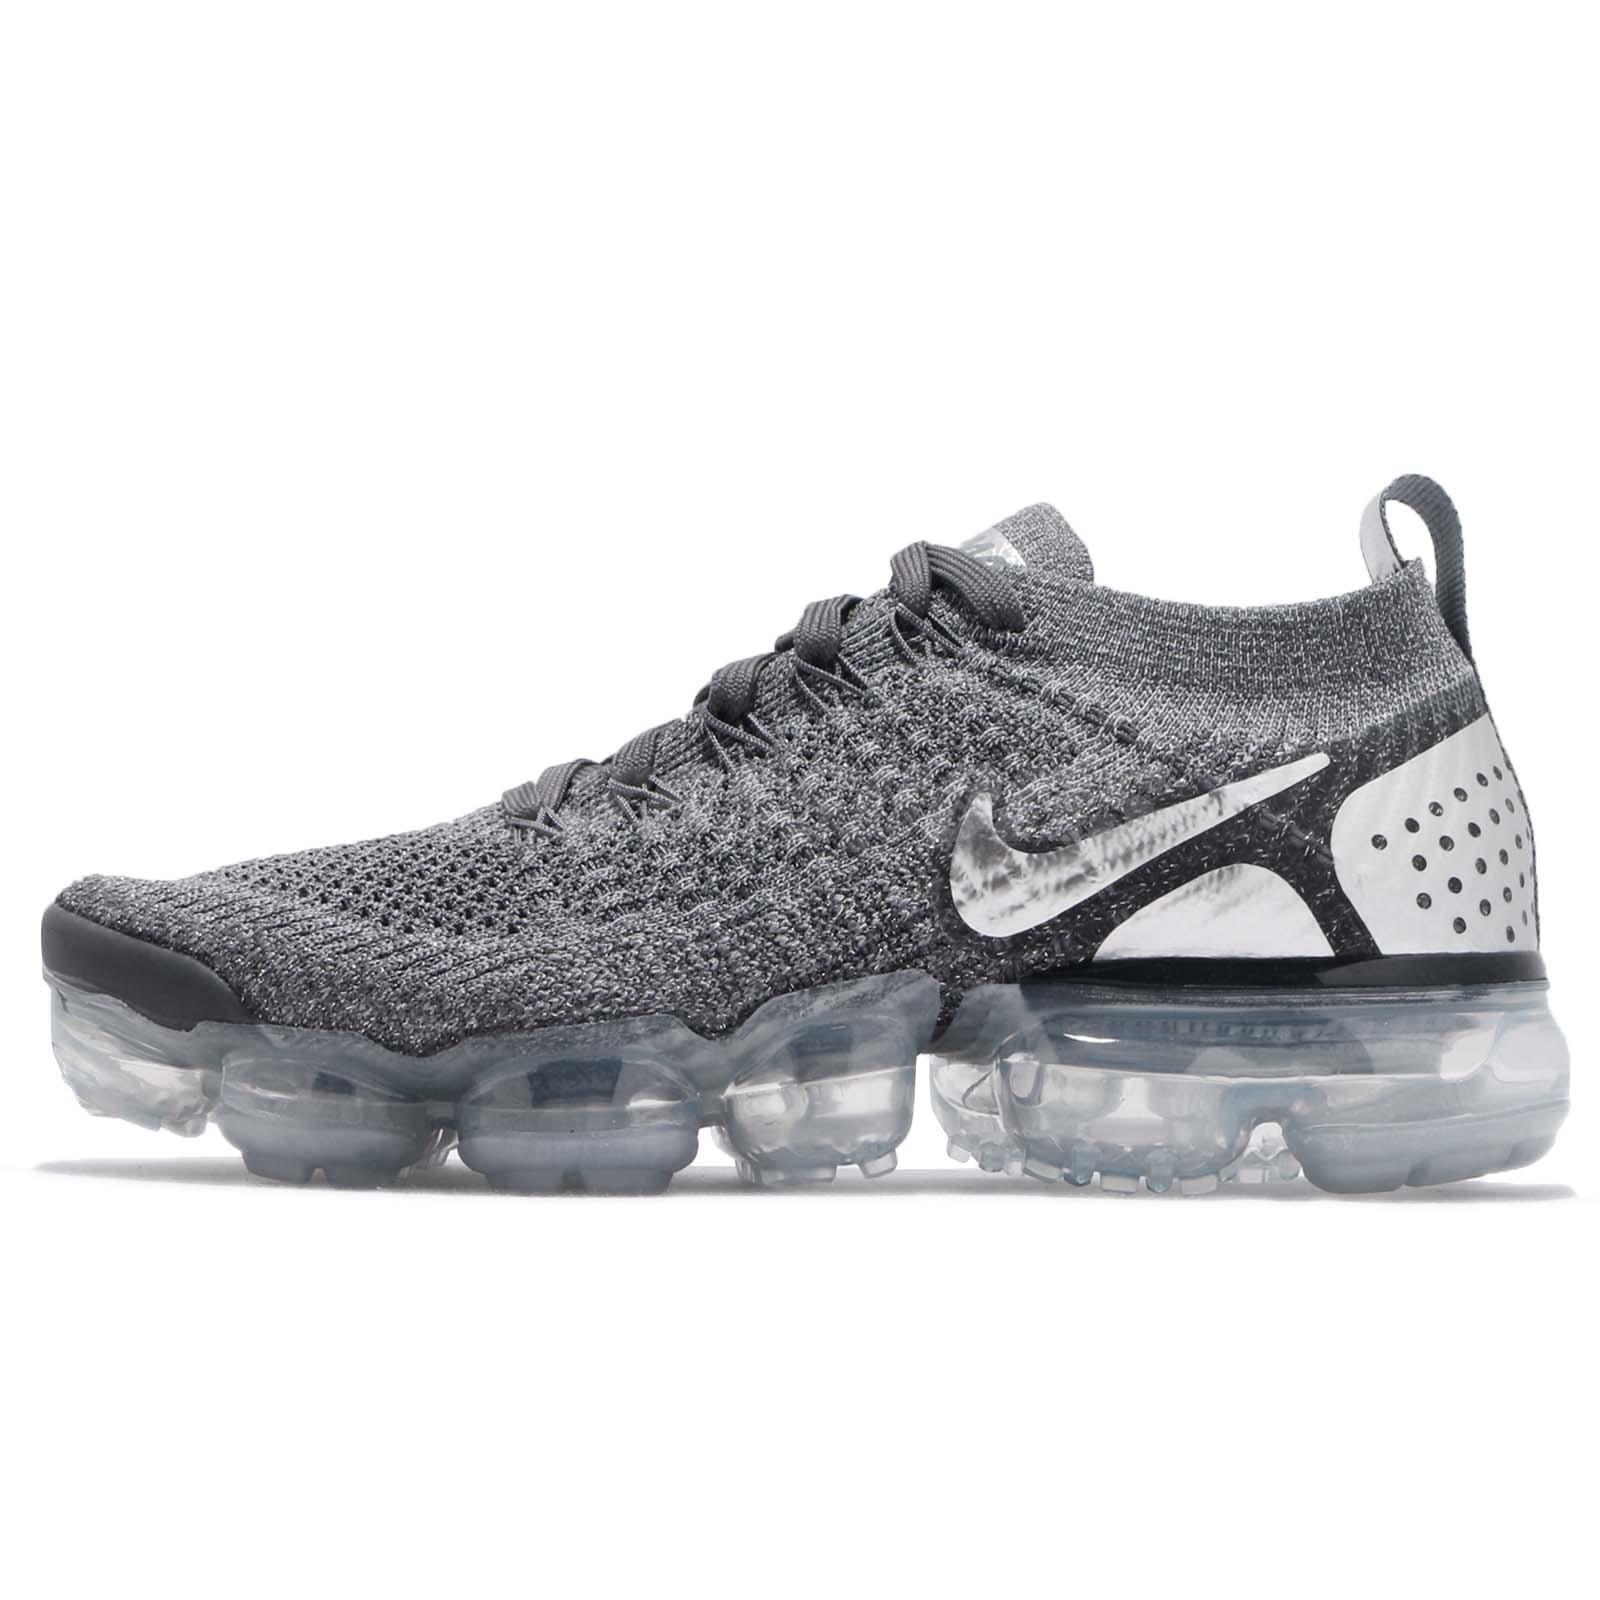 Details about Nike Wmns Air Vapormax Flyknit 2 Dark Grey Chrome Women Running Shoes 942843 013